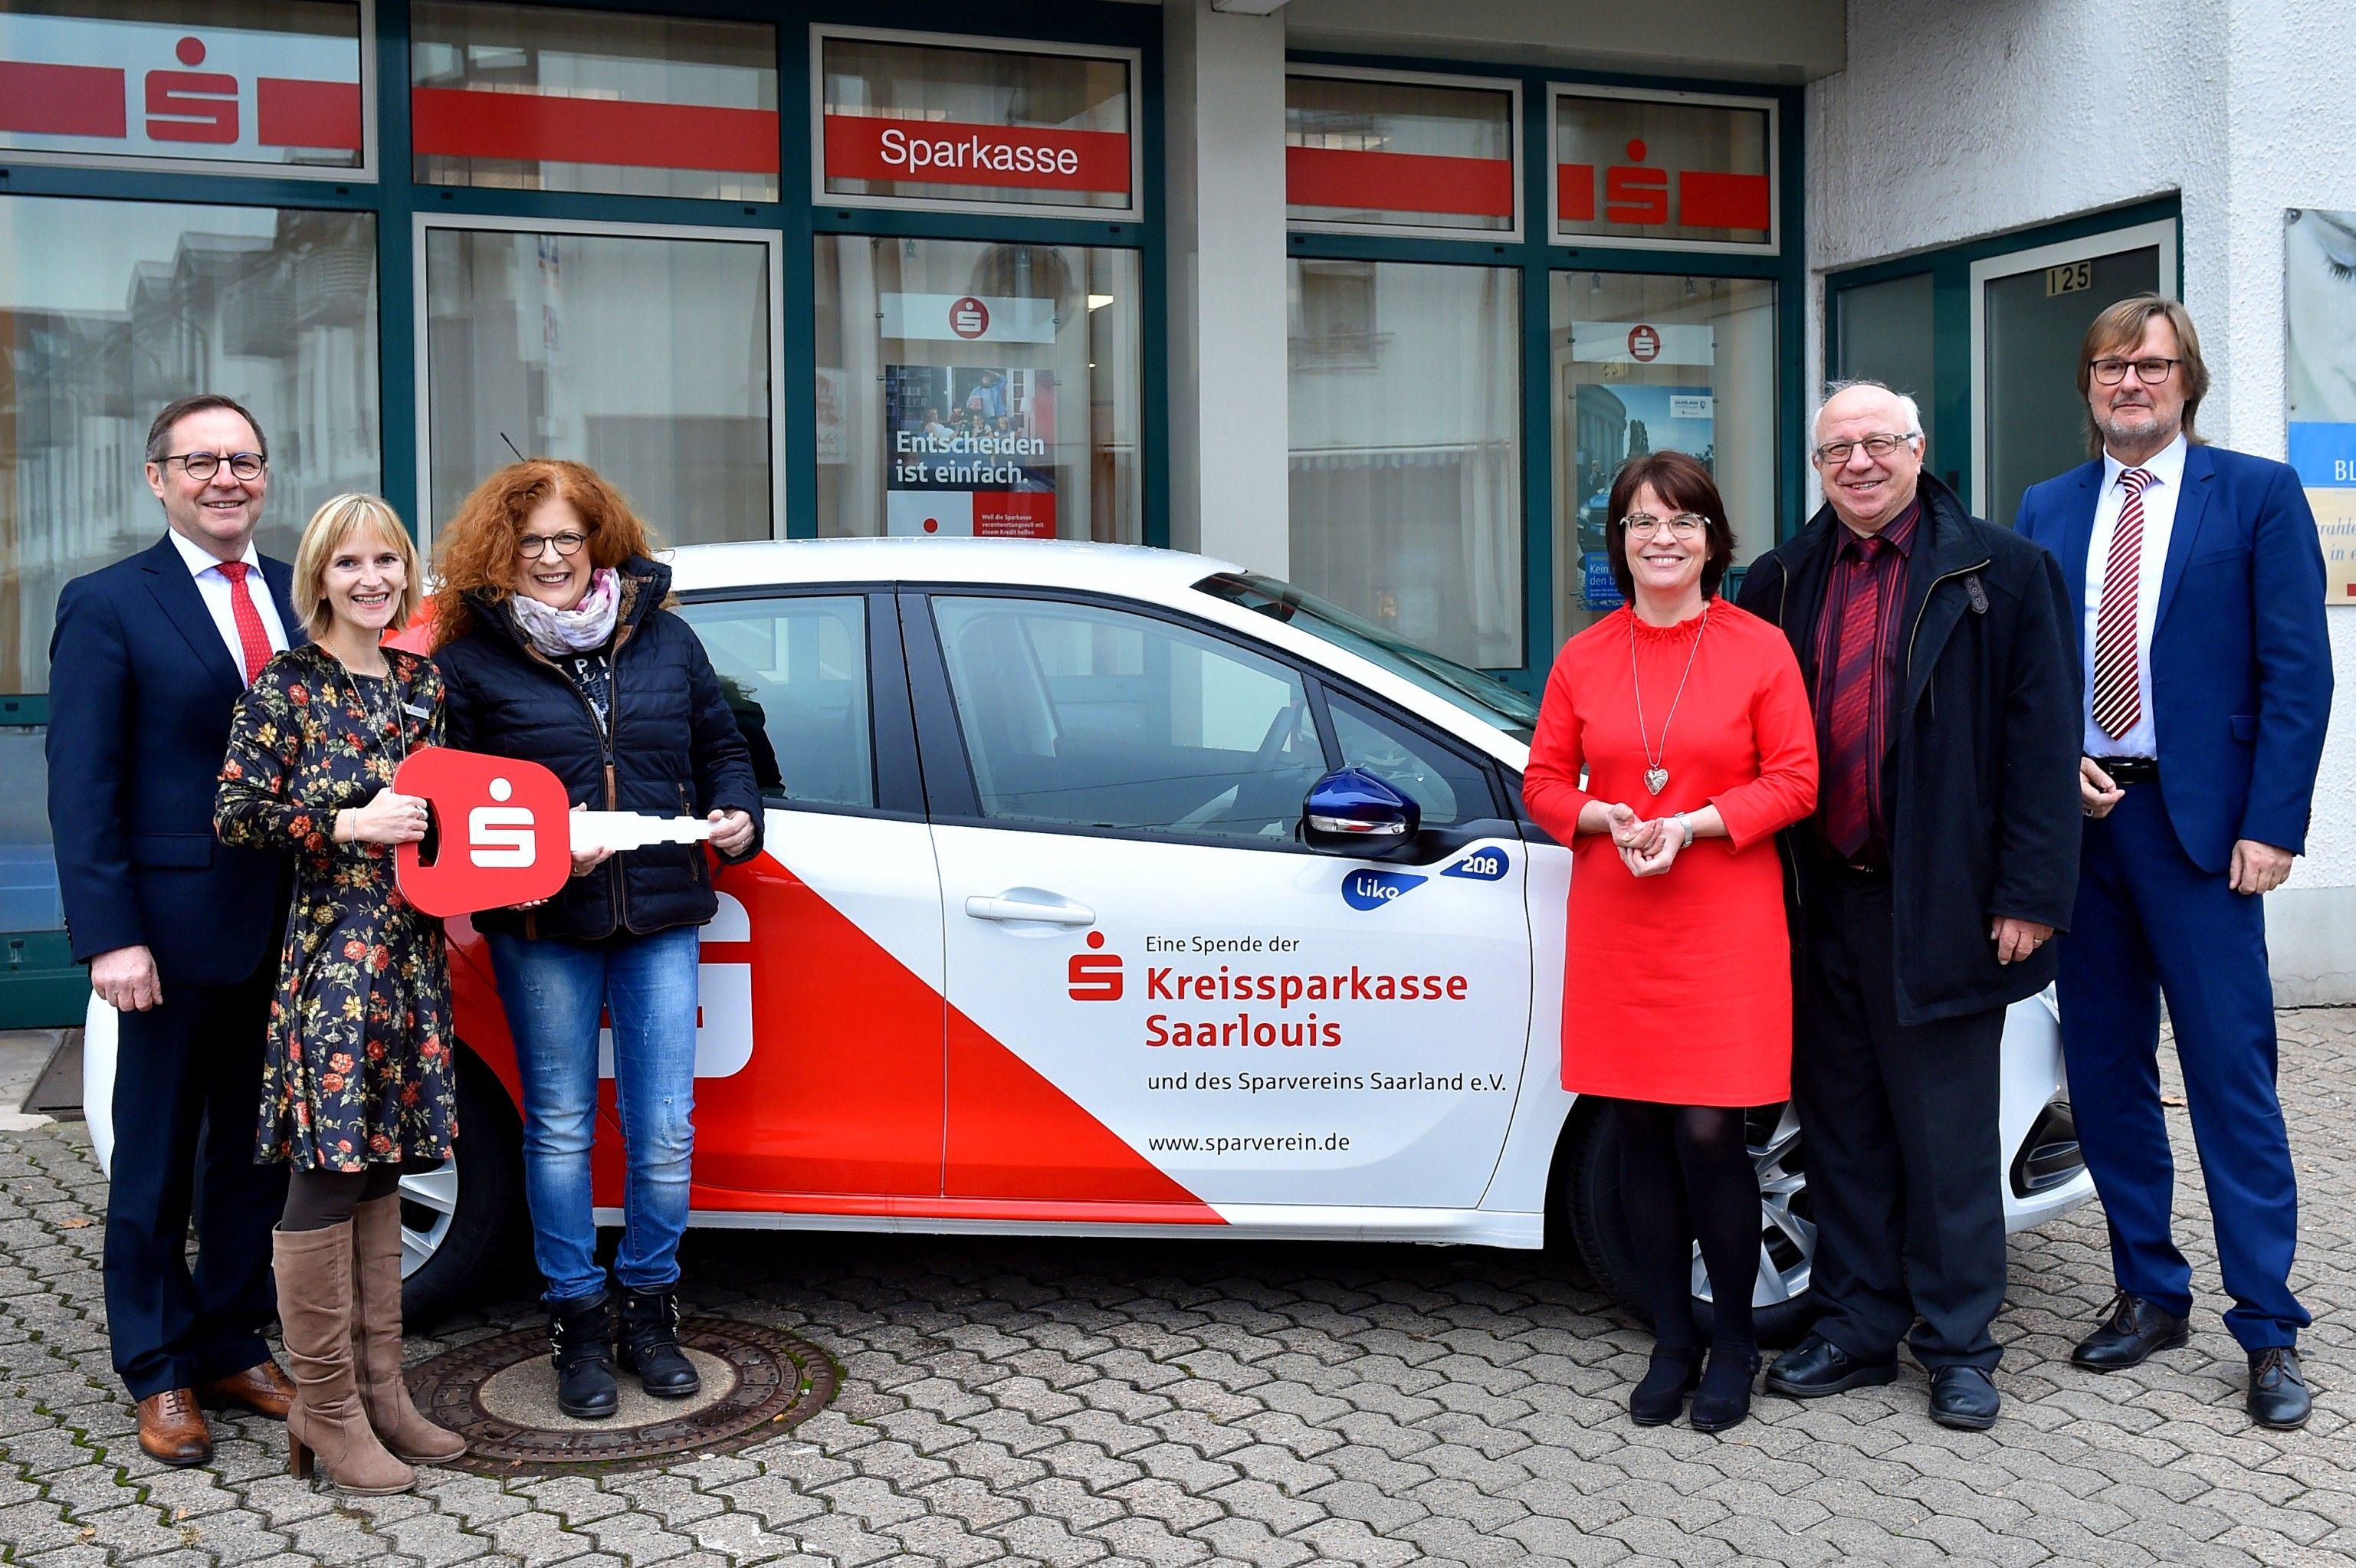 ksk-Sparv-Autoueberg-CarSozStat-Schwalb-Elm_2018.jpg